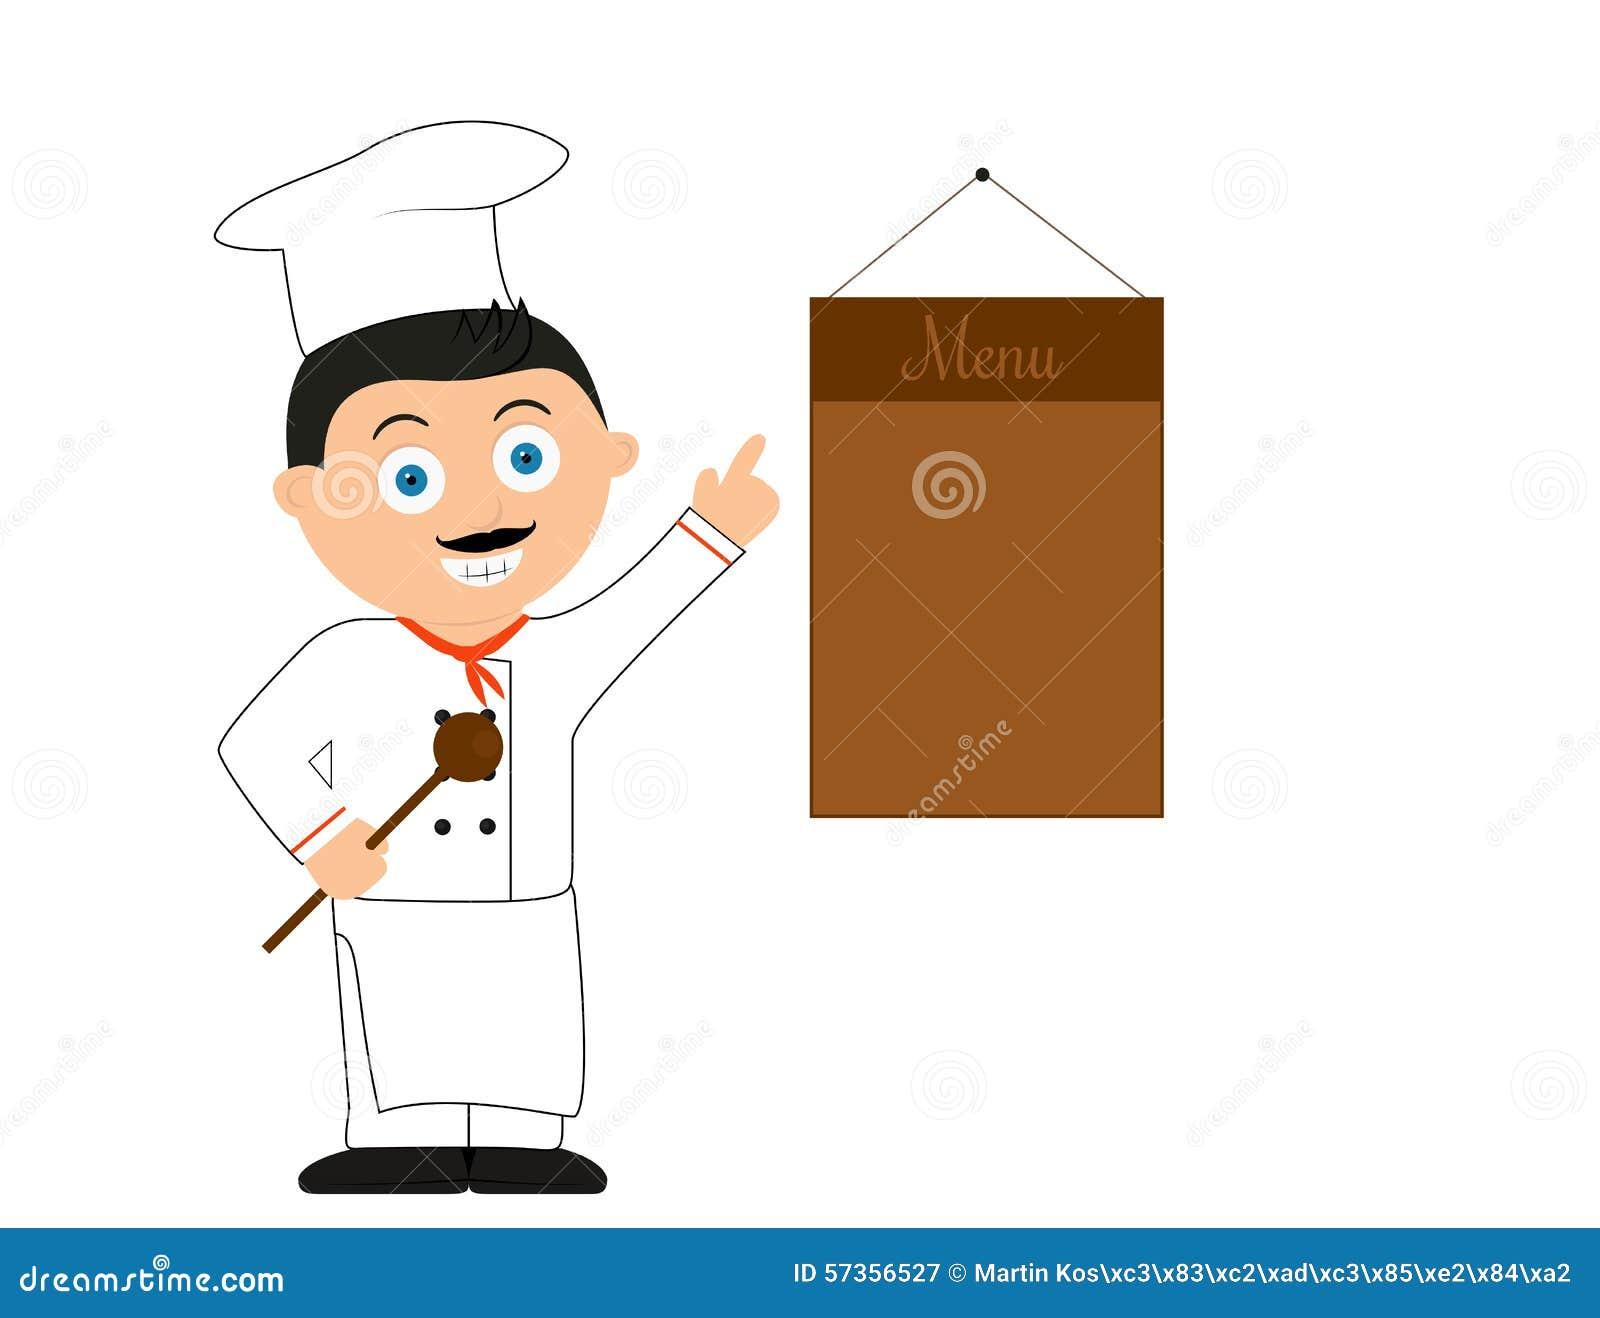 vector cartoon illustration of chef man stock vector image 57356527